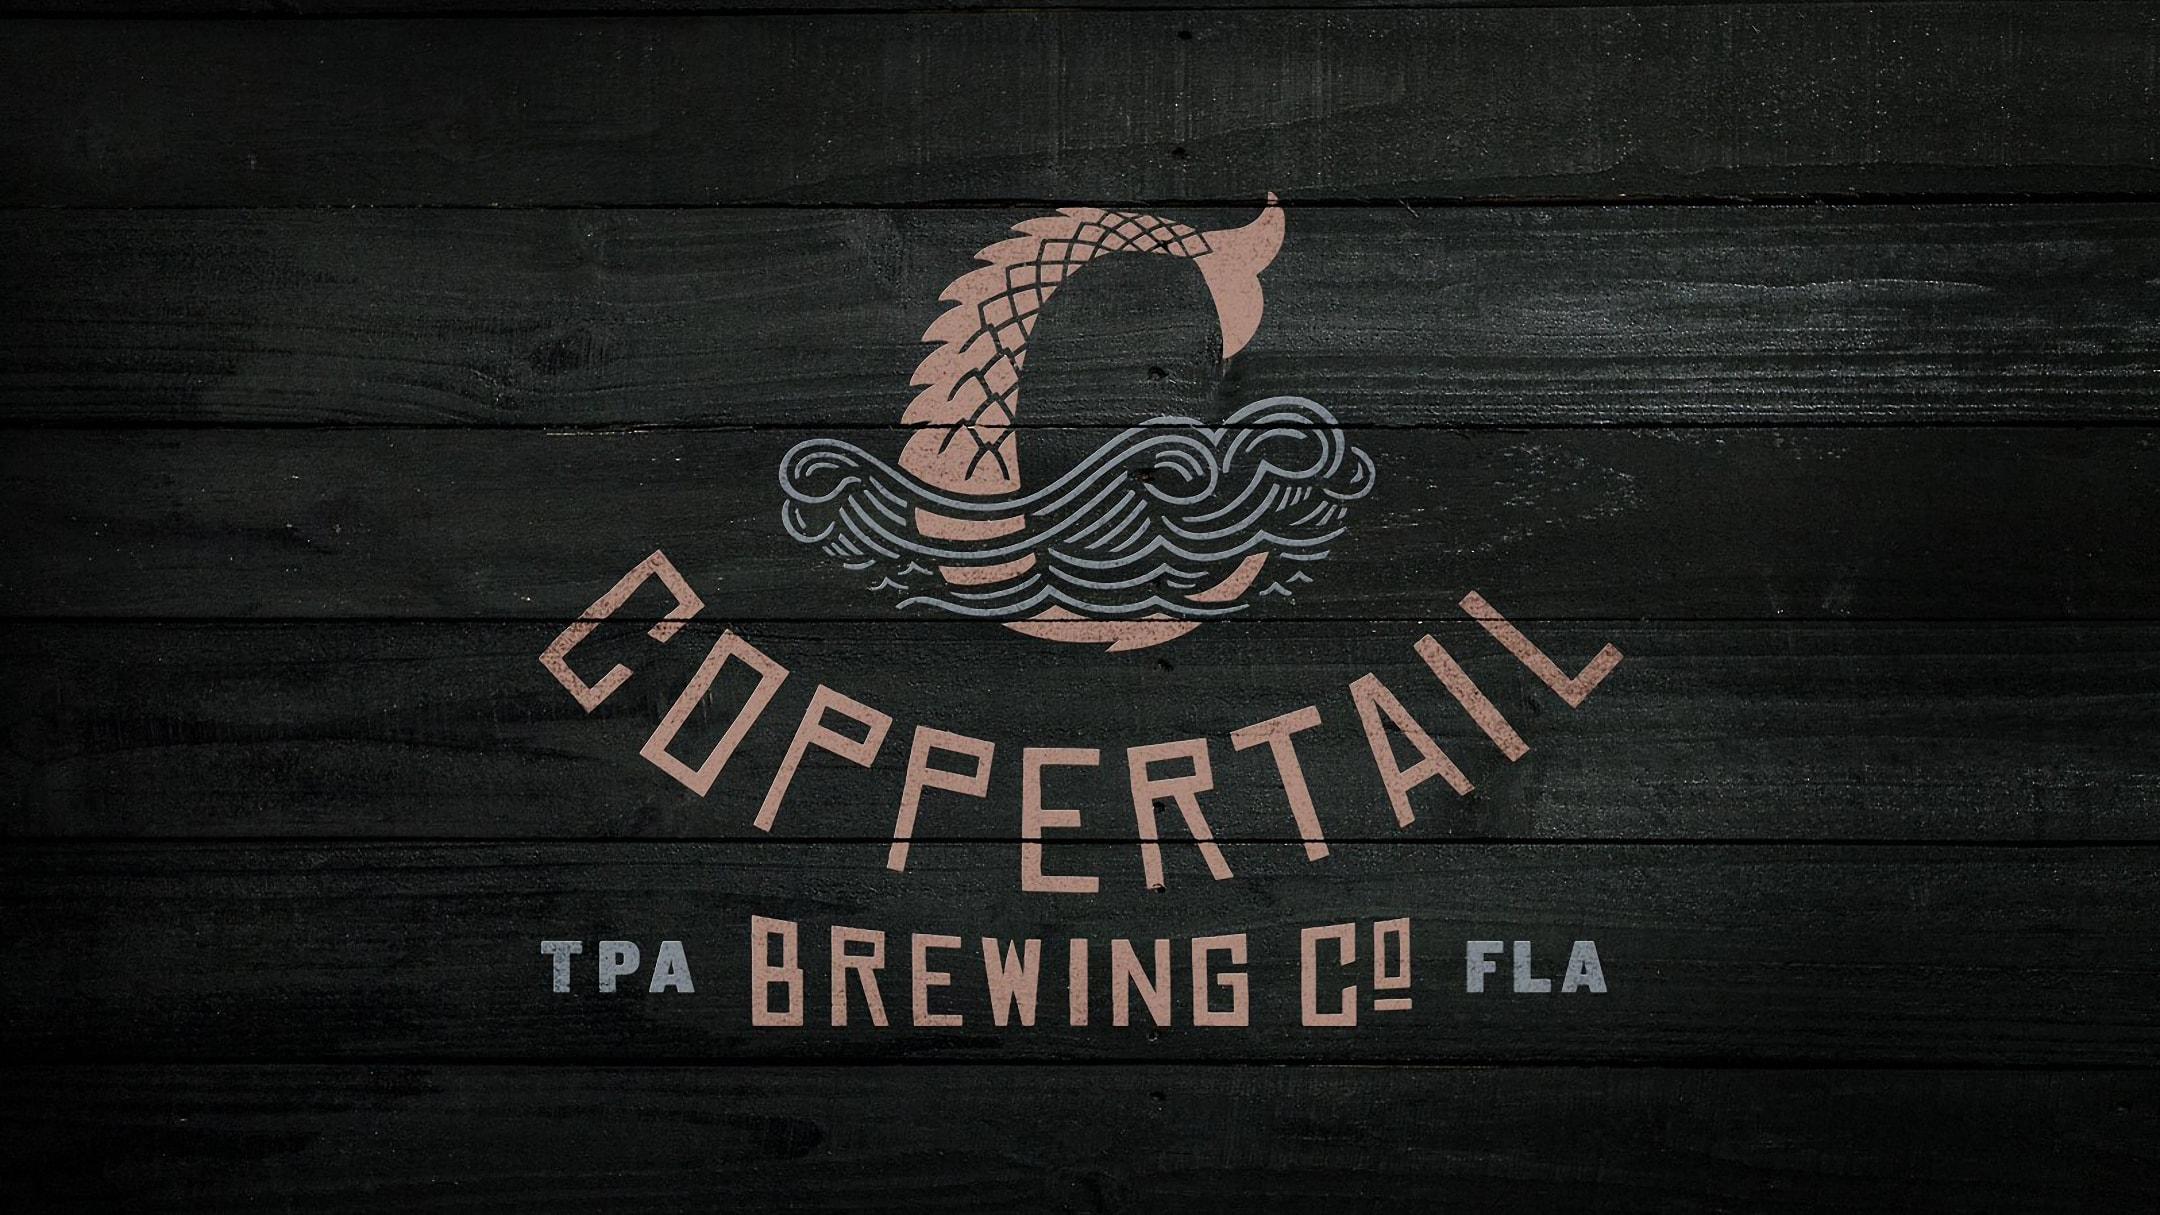 Coppertail logo.